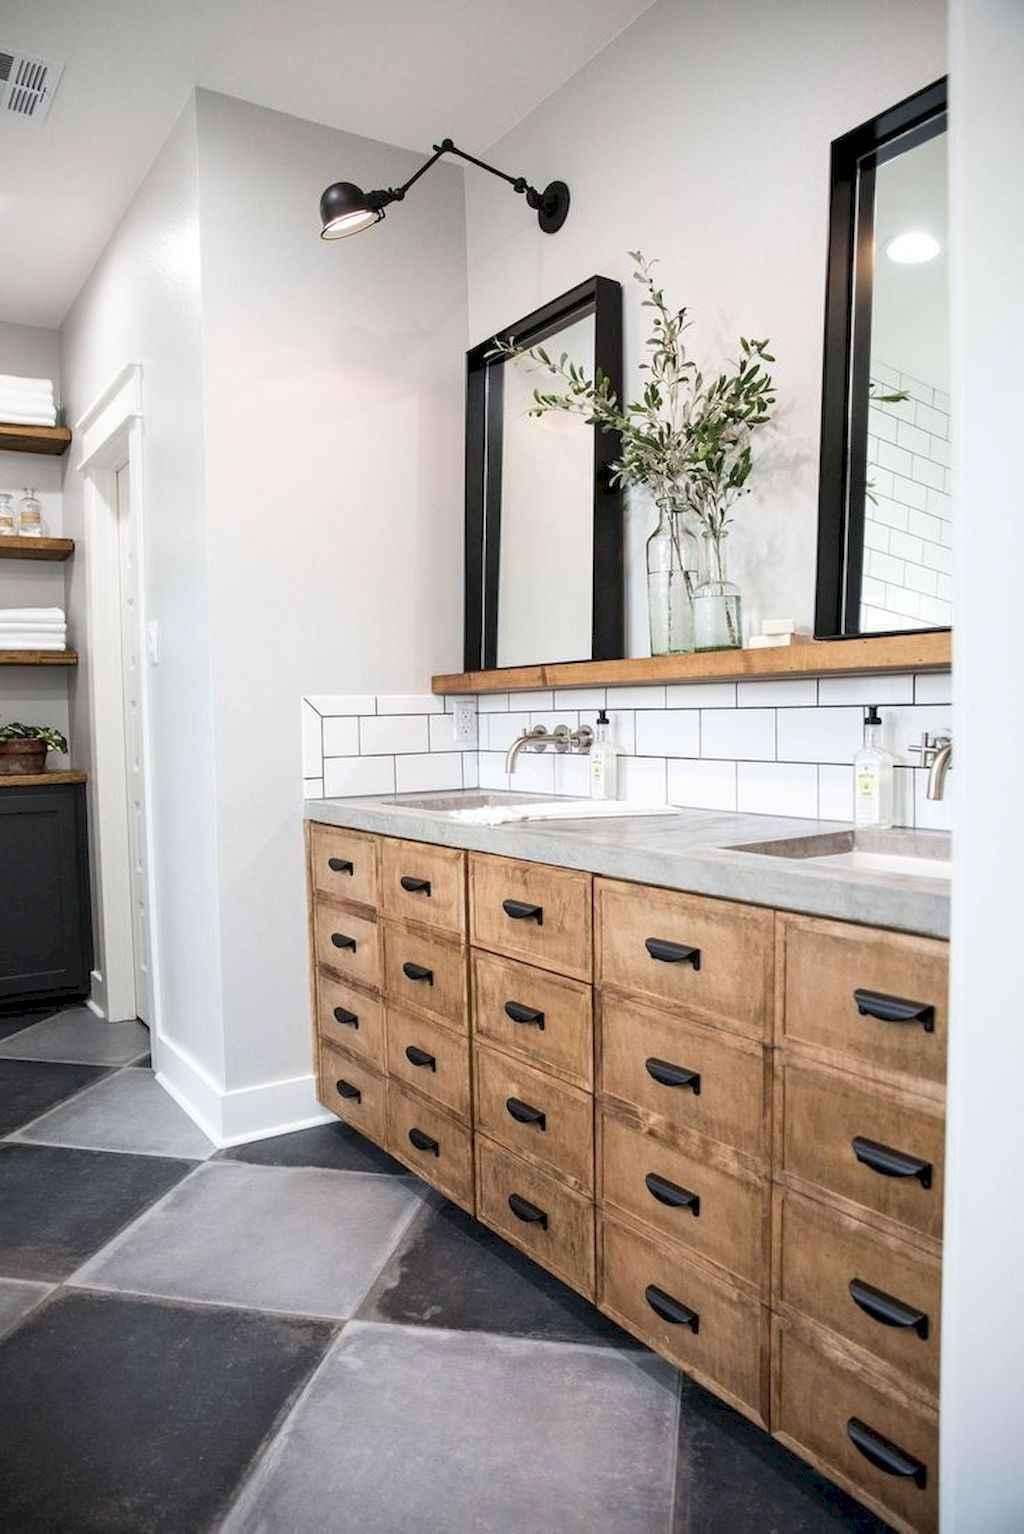 125 awesome farmhouse bathroom vanity remodel ideas (94)